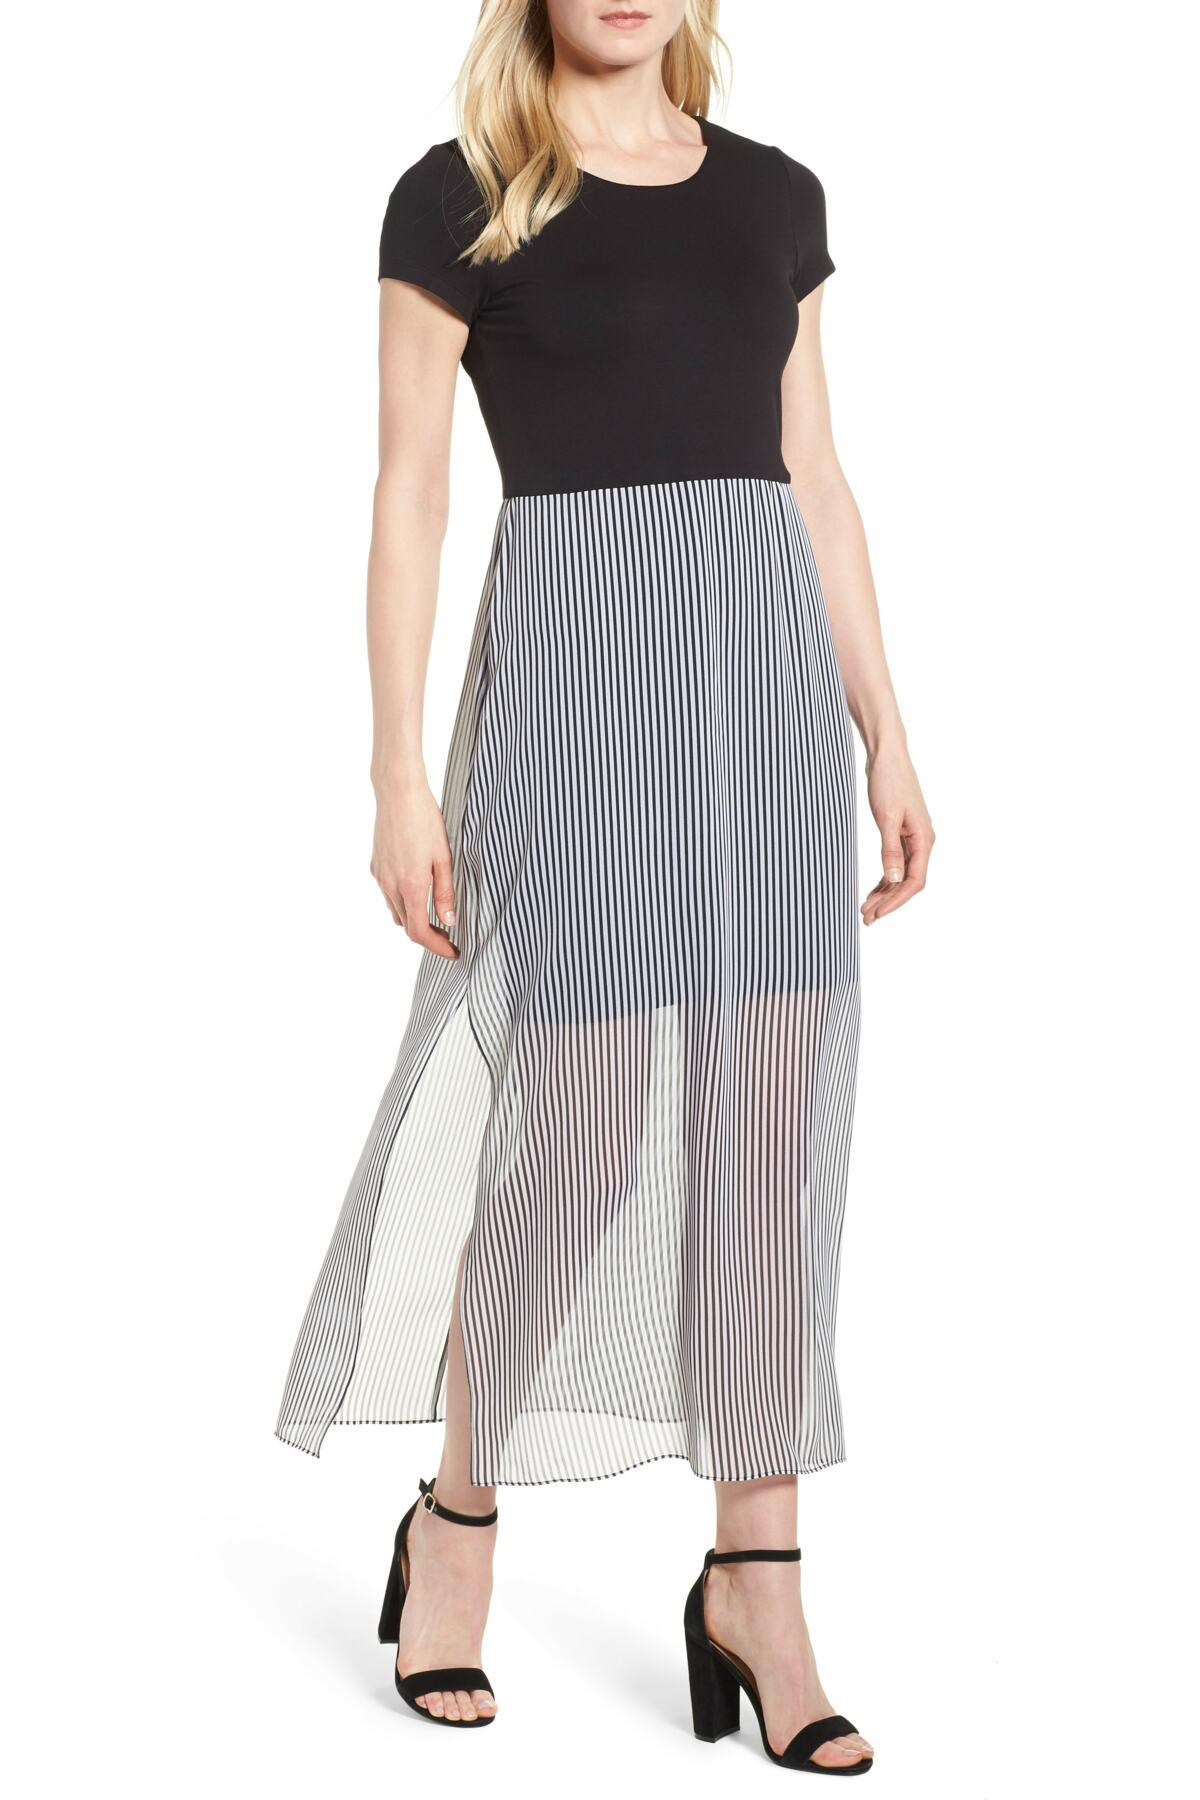 a66269289c8 Lyst - Vince Camuto Stripe Chiffon Overlay Maxi Dress in Black